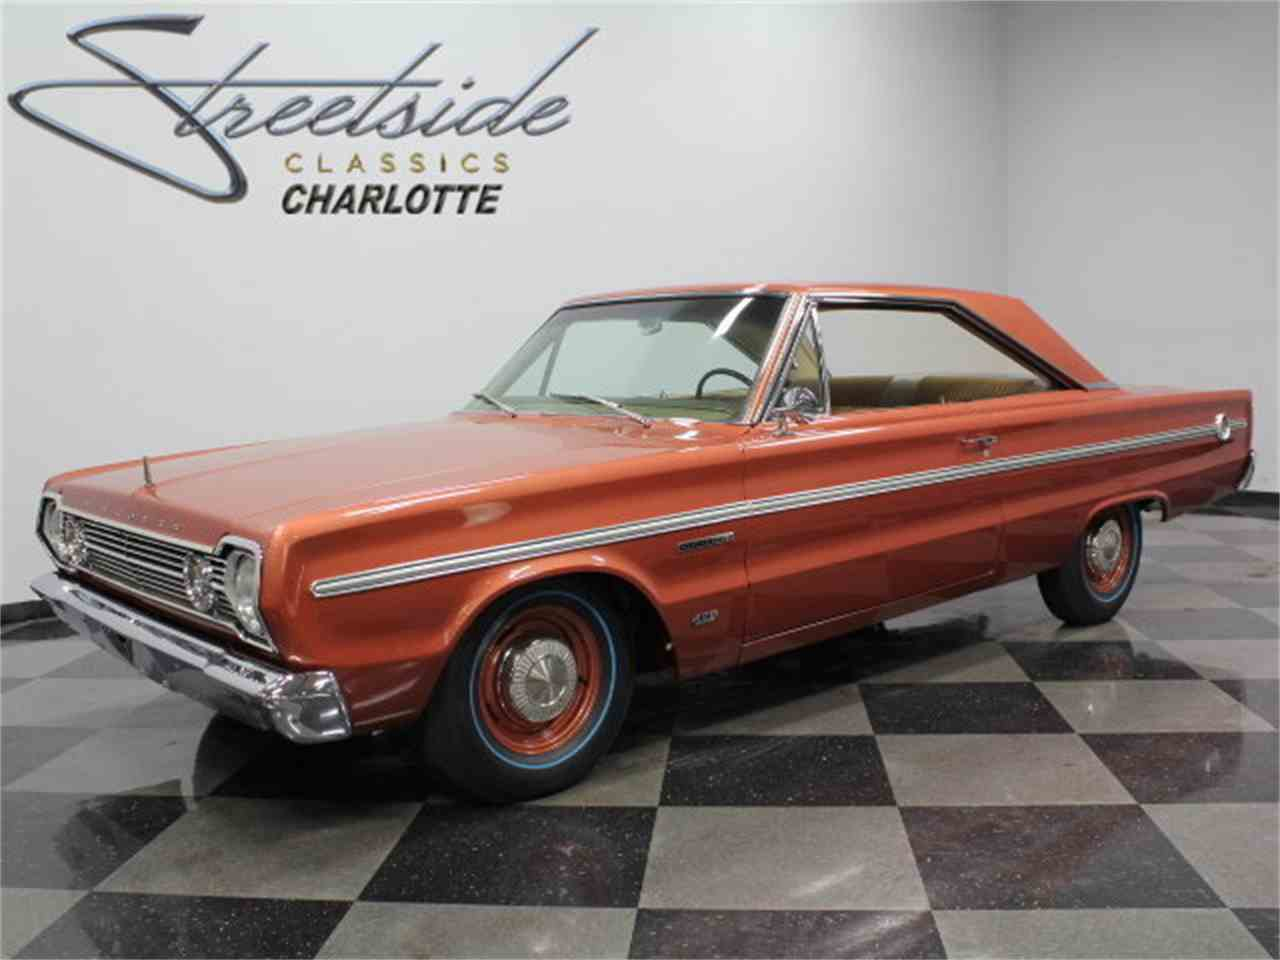 1966 Plymouth Belvedere II 426 HEMI for Sale - CC-600558